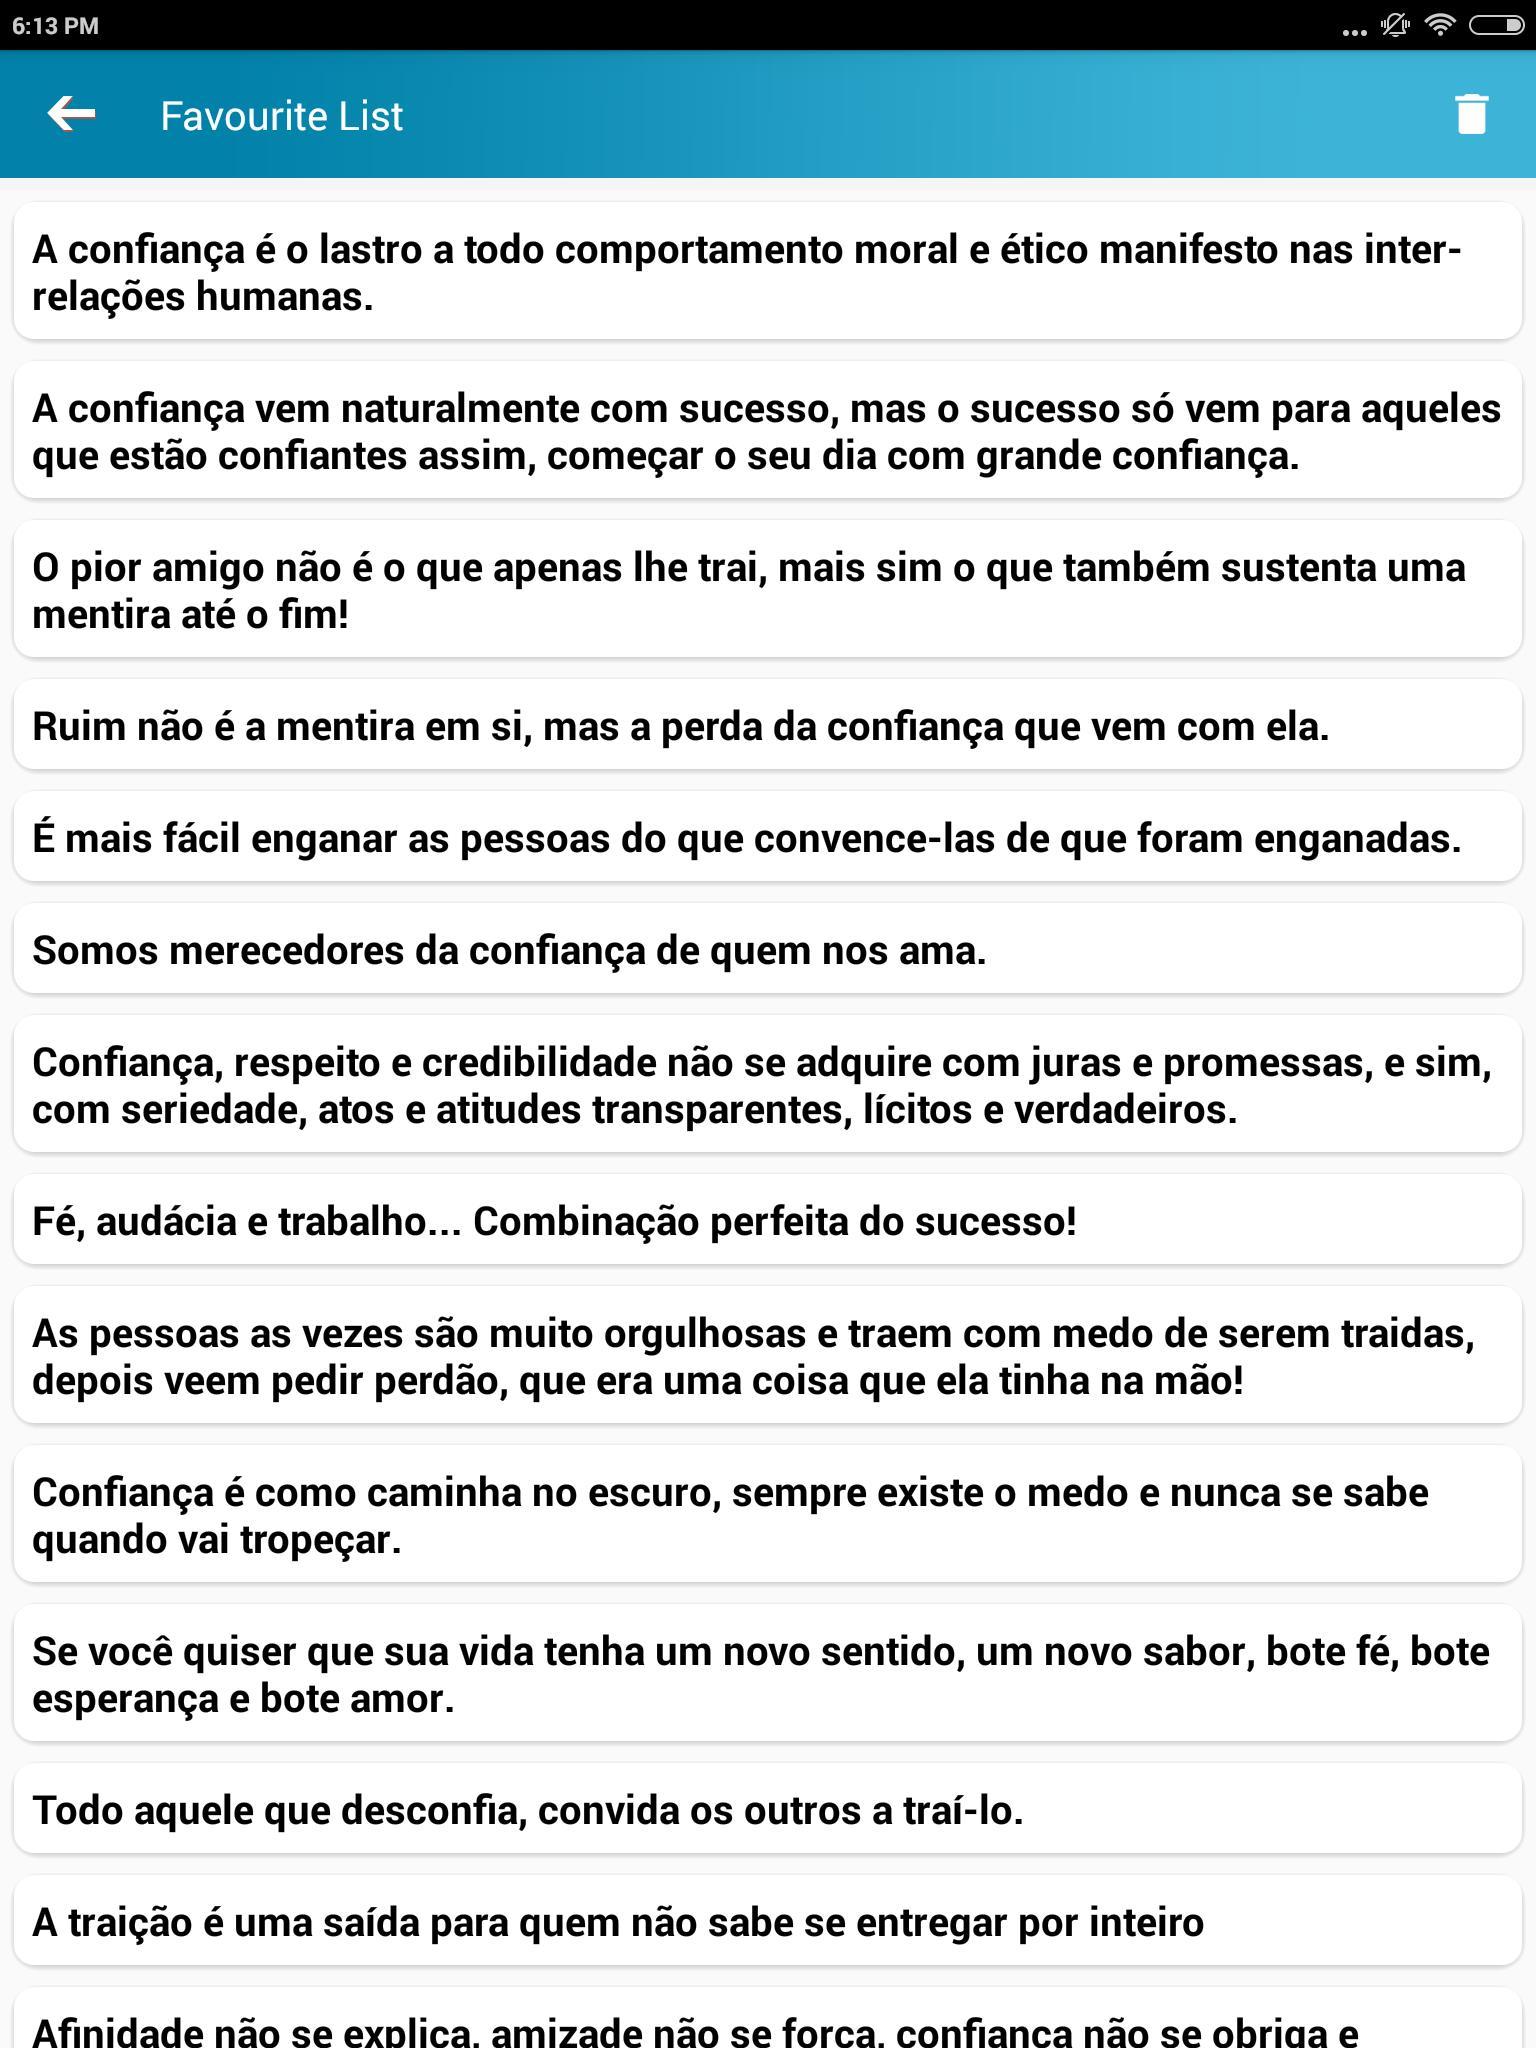 Cita§µes portuguesas sobre confian§a e fé for Android APK